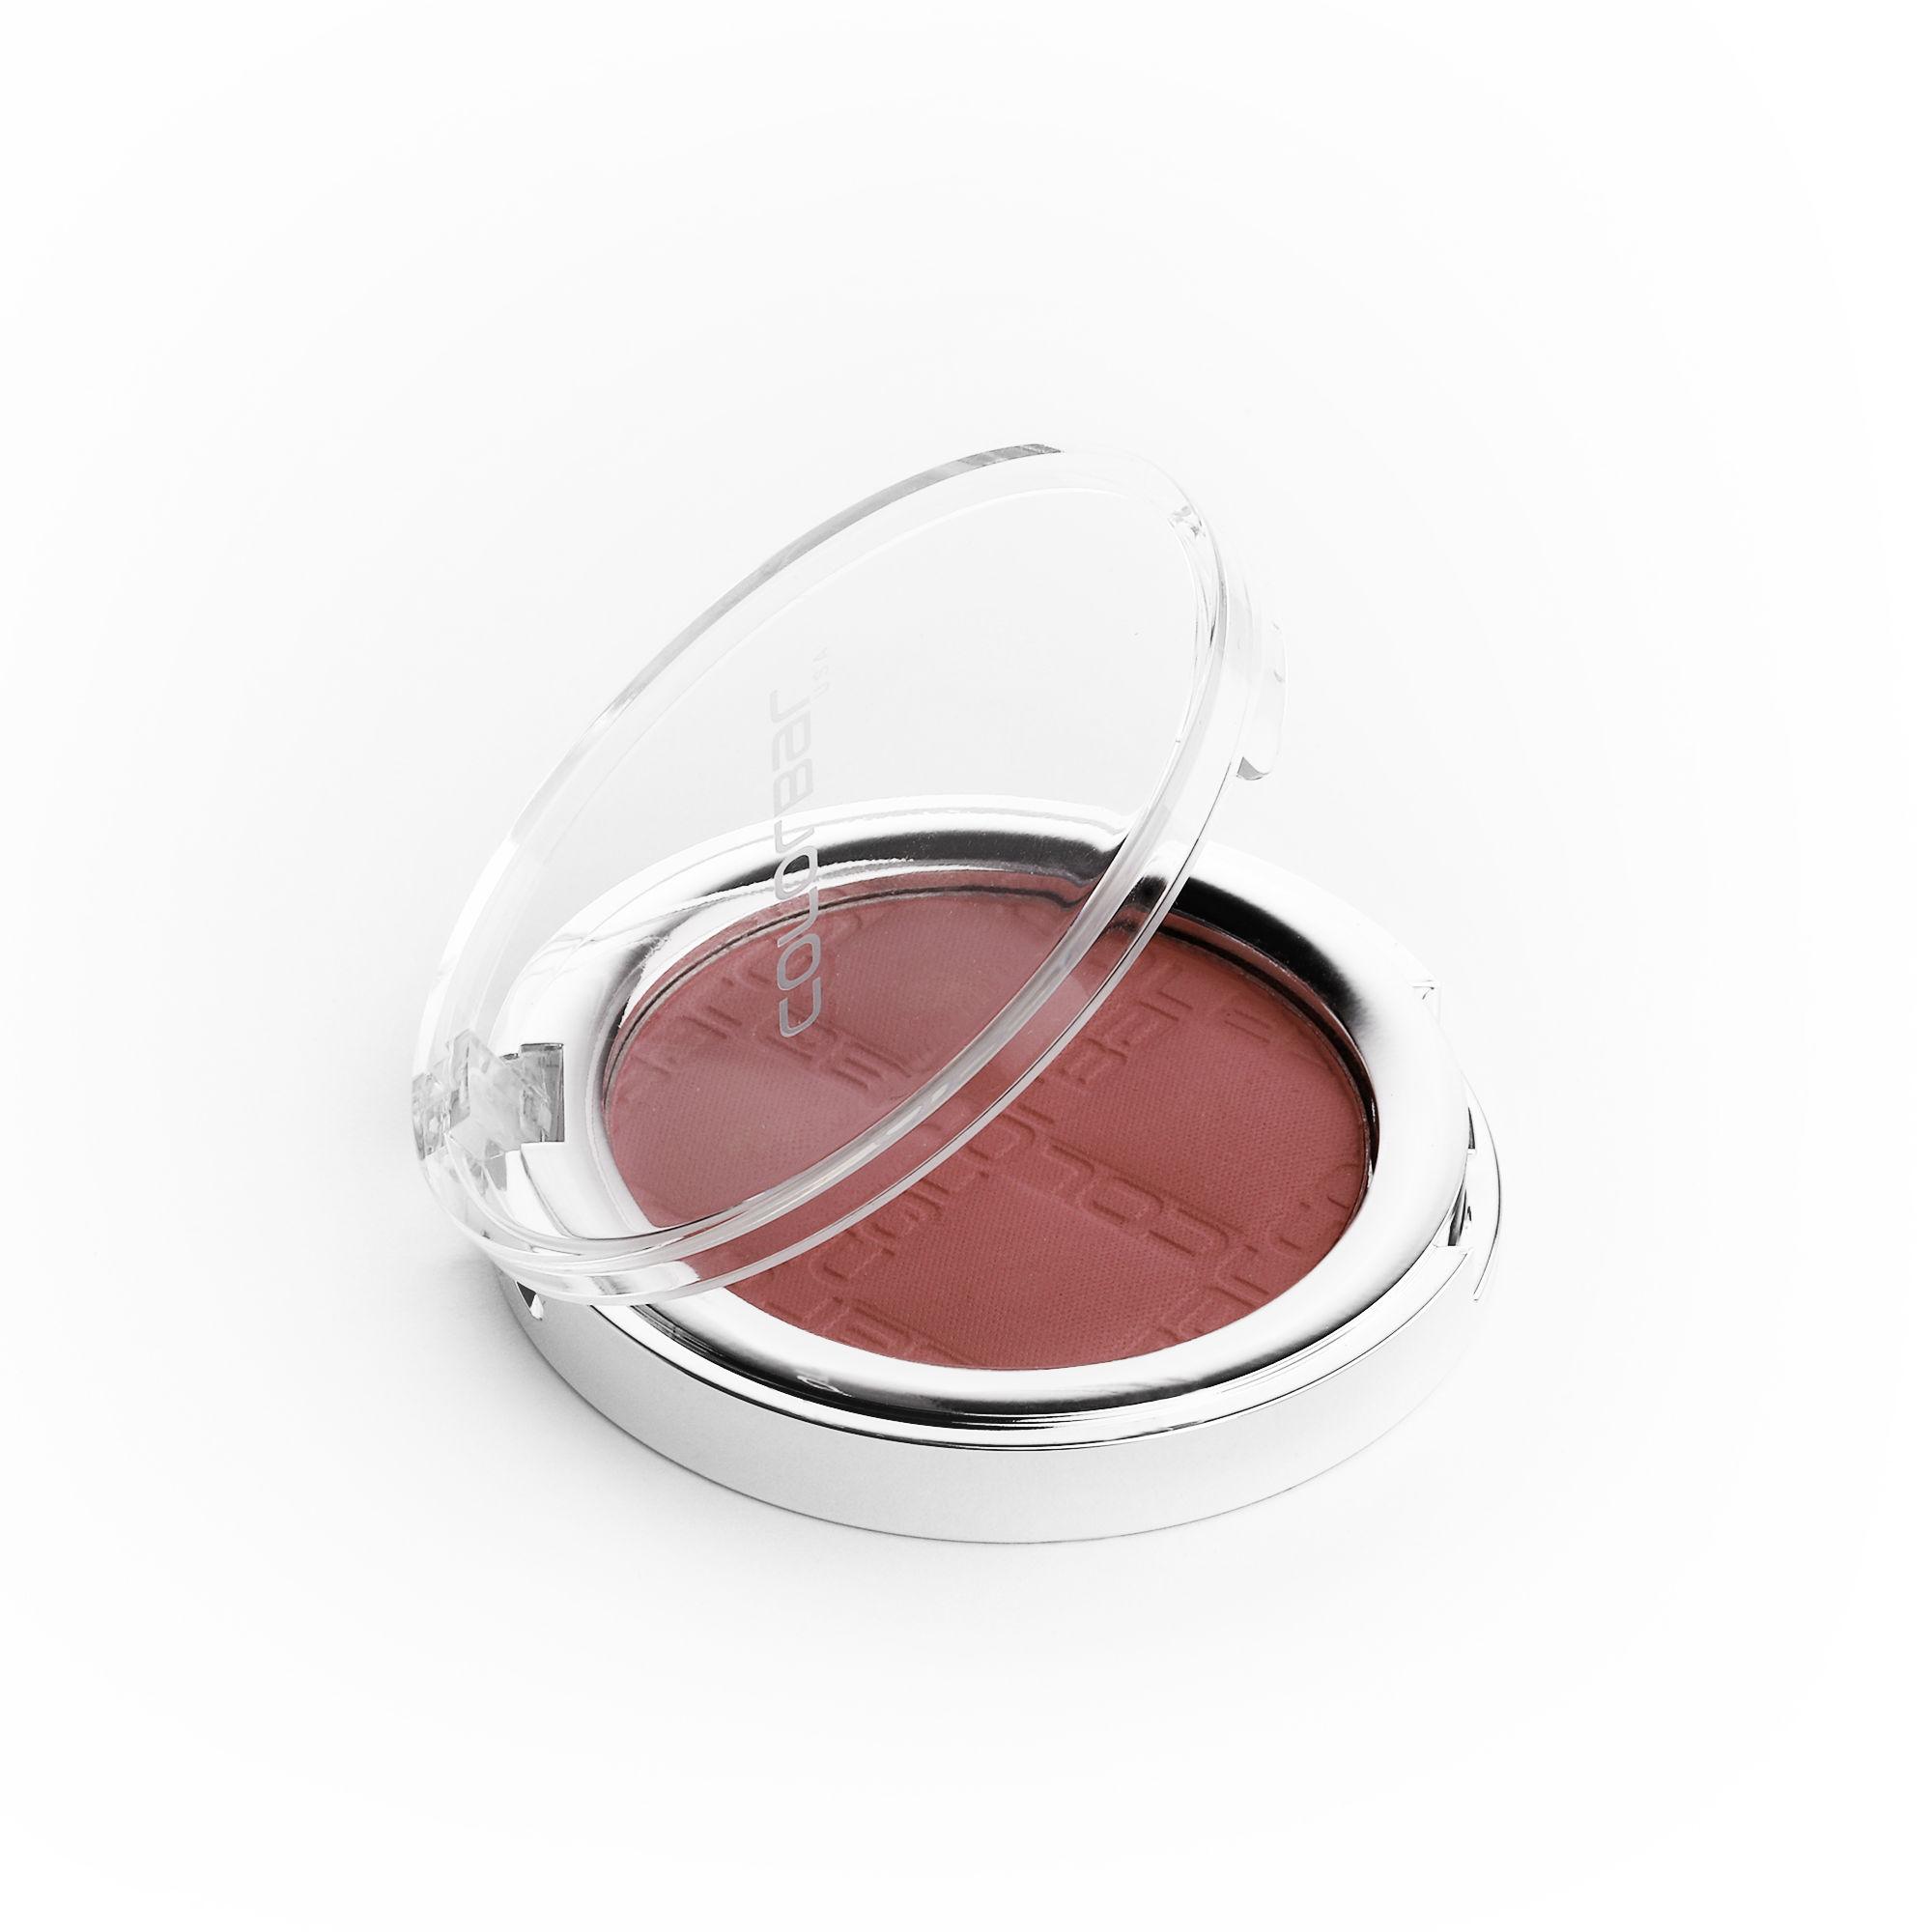 Colorbar Cheekillusion Blush - 011 Bronzing Glaze